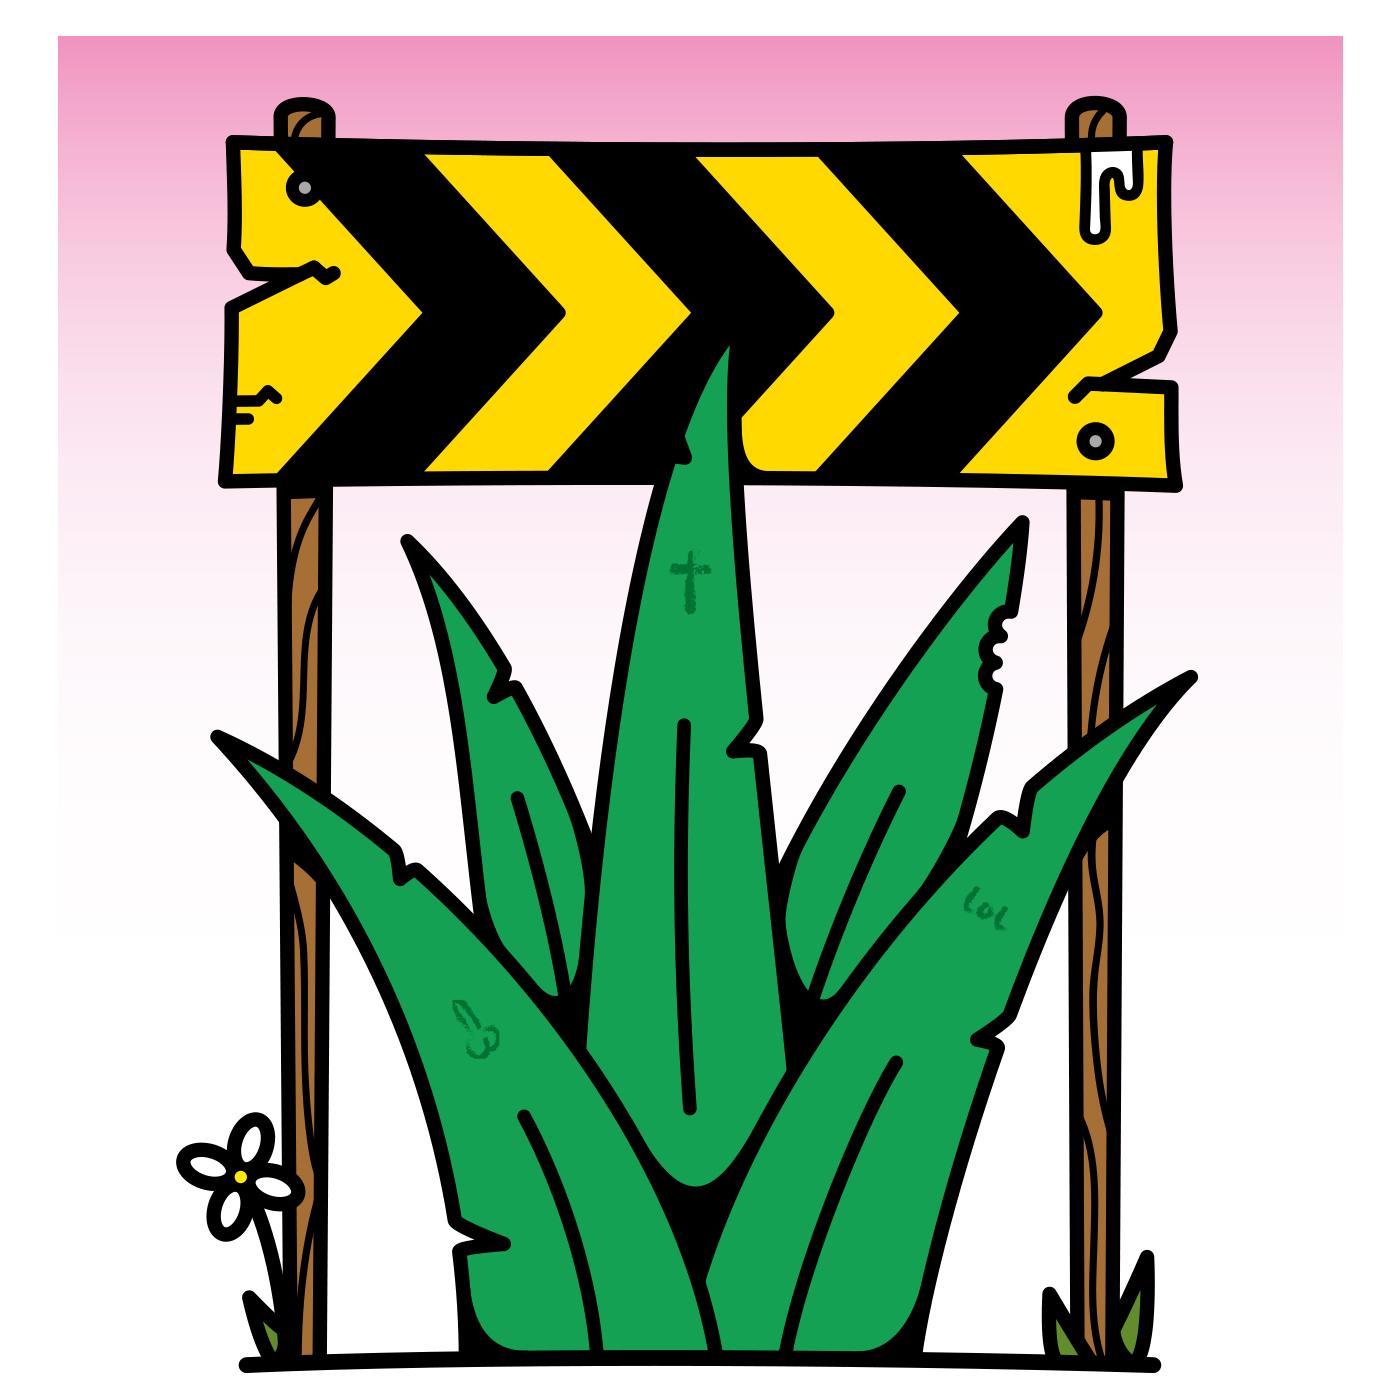 bush-mikko-heino.jpg